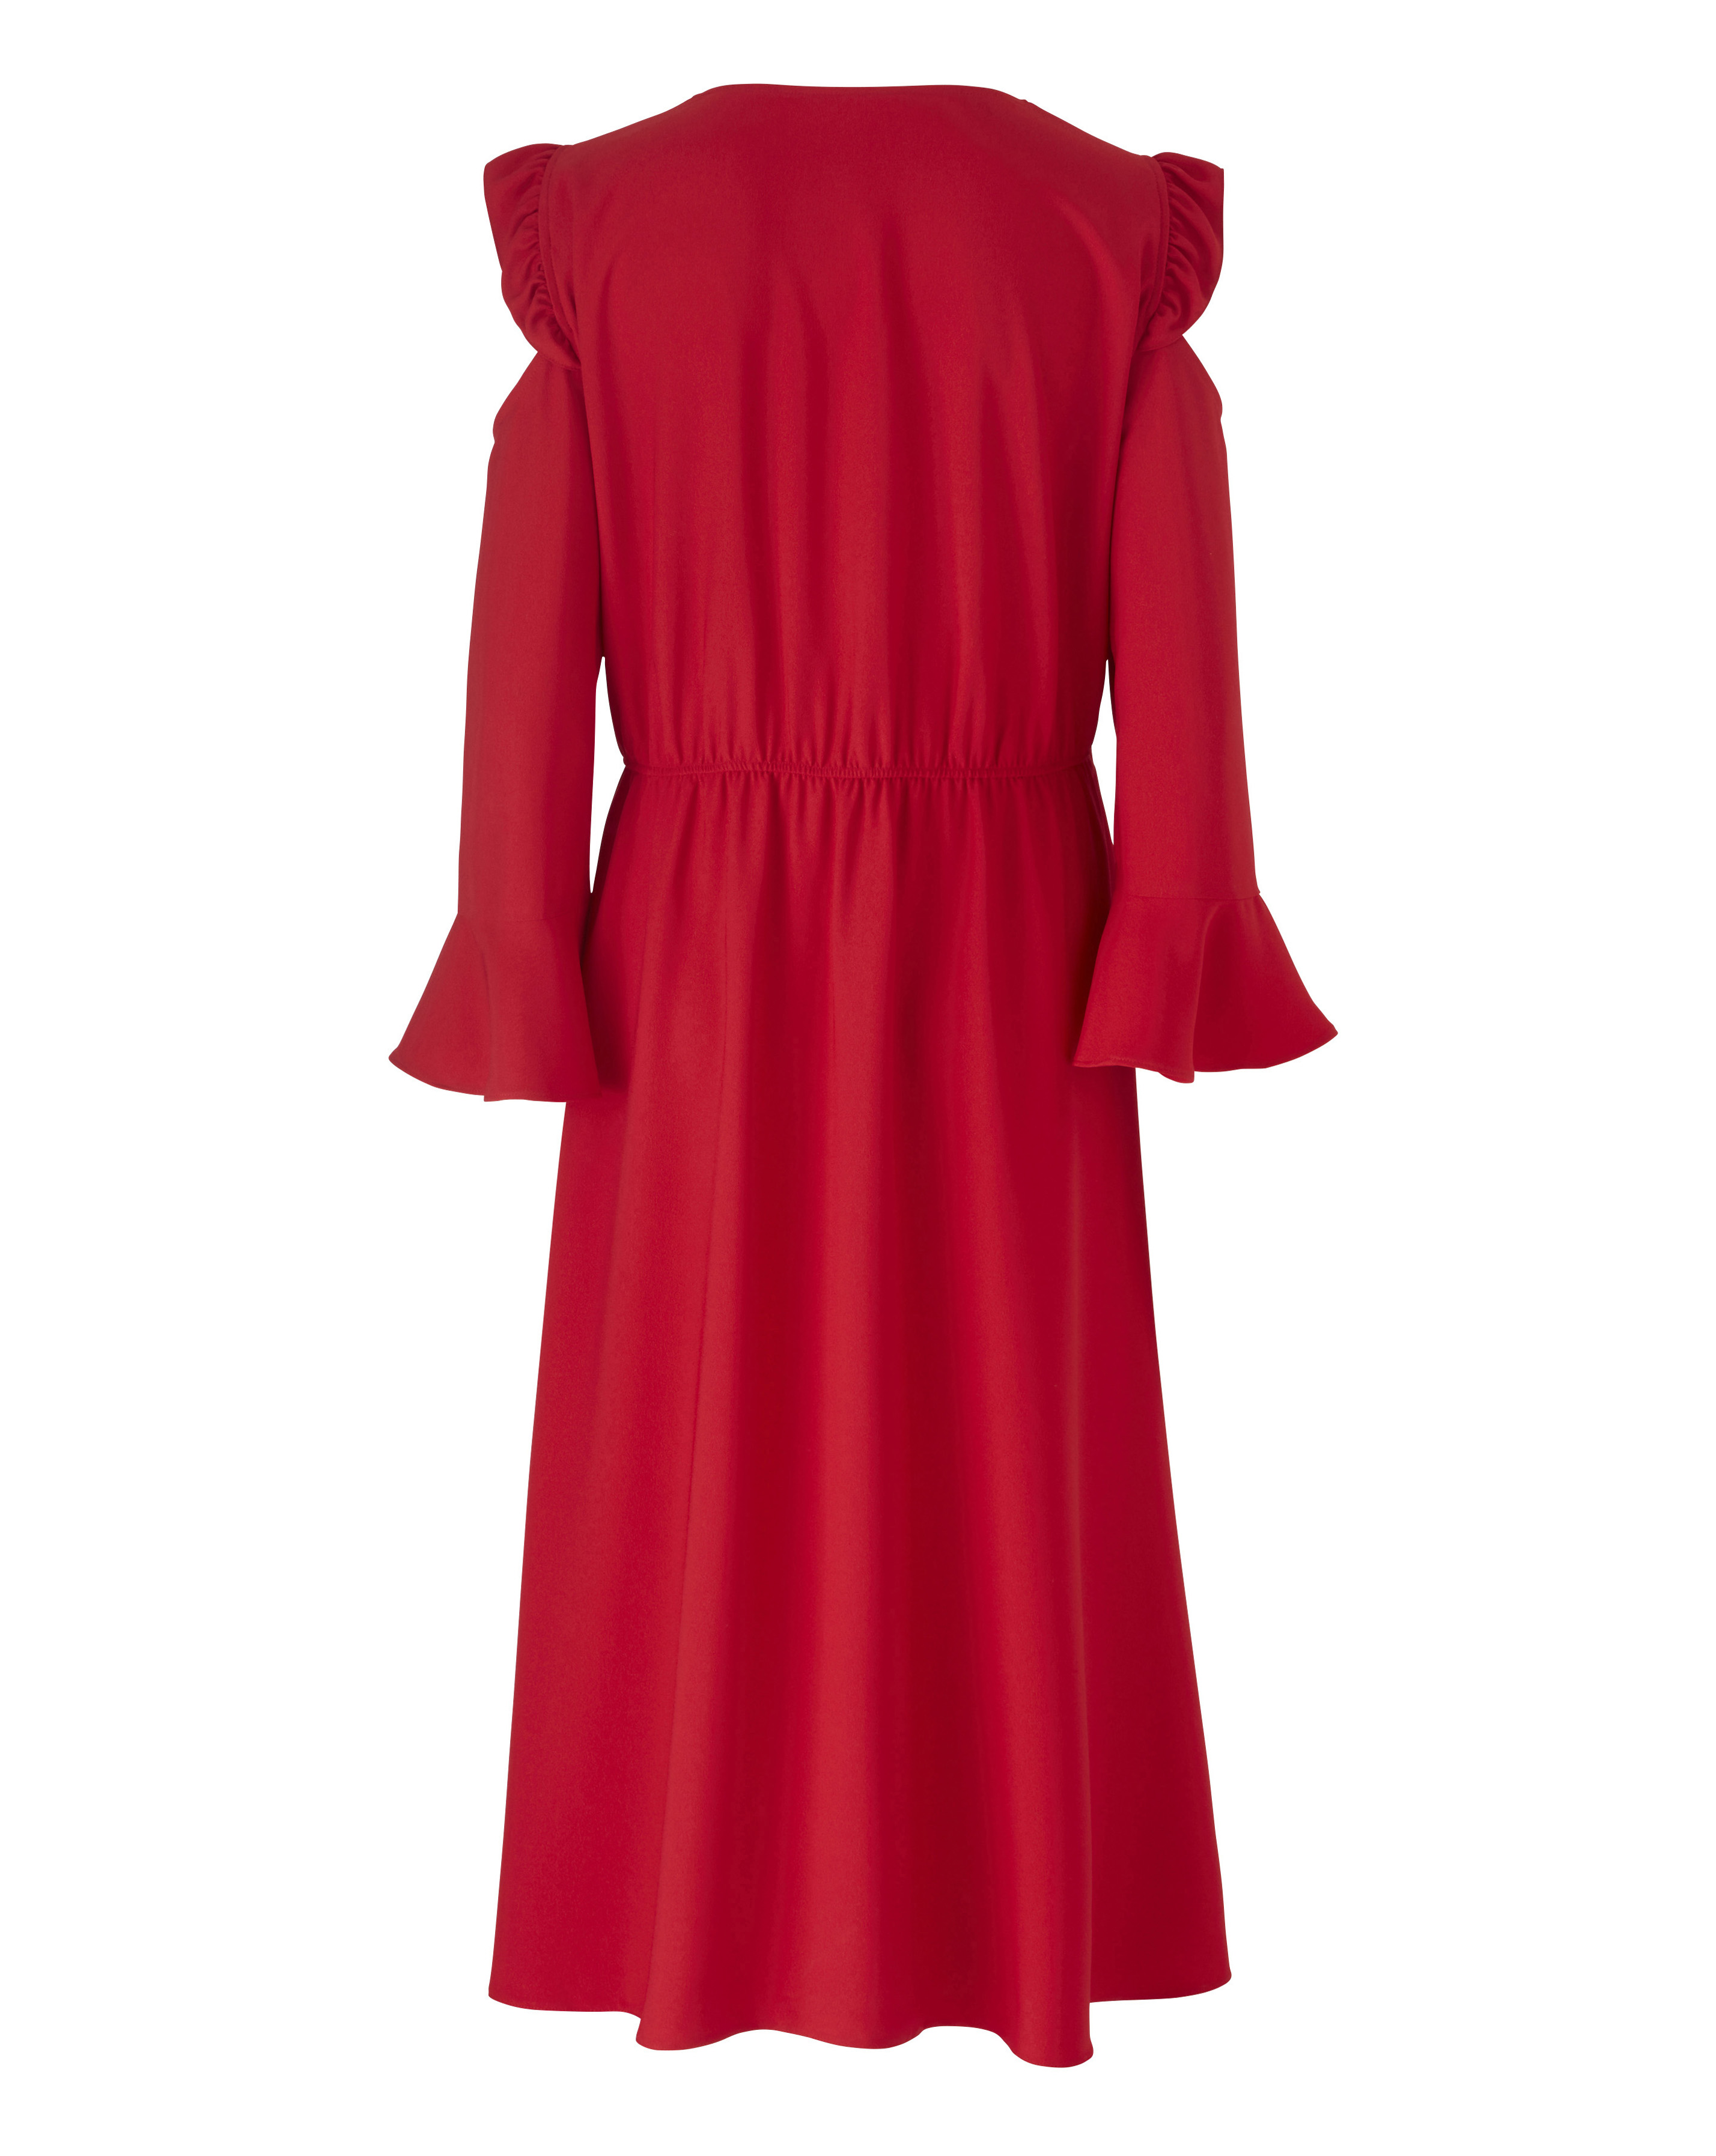 New-Simply-Be-Womens-Wrap-Ruffle-Sleeve-Dress